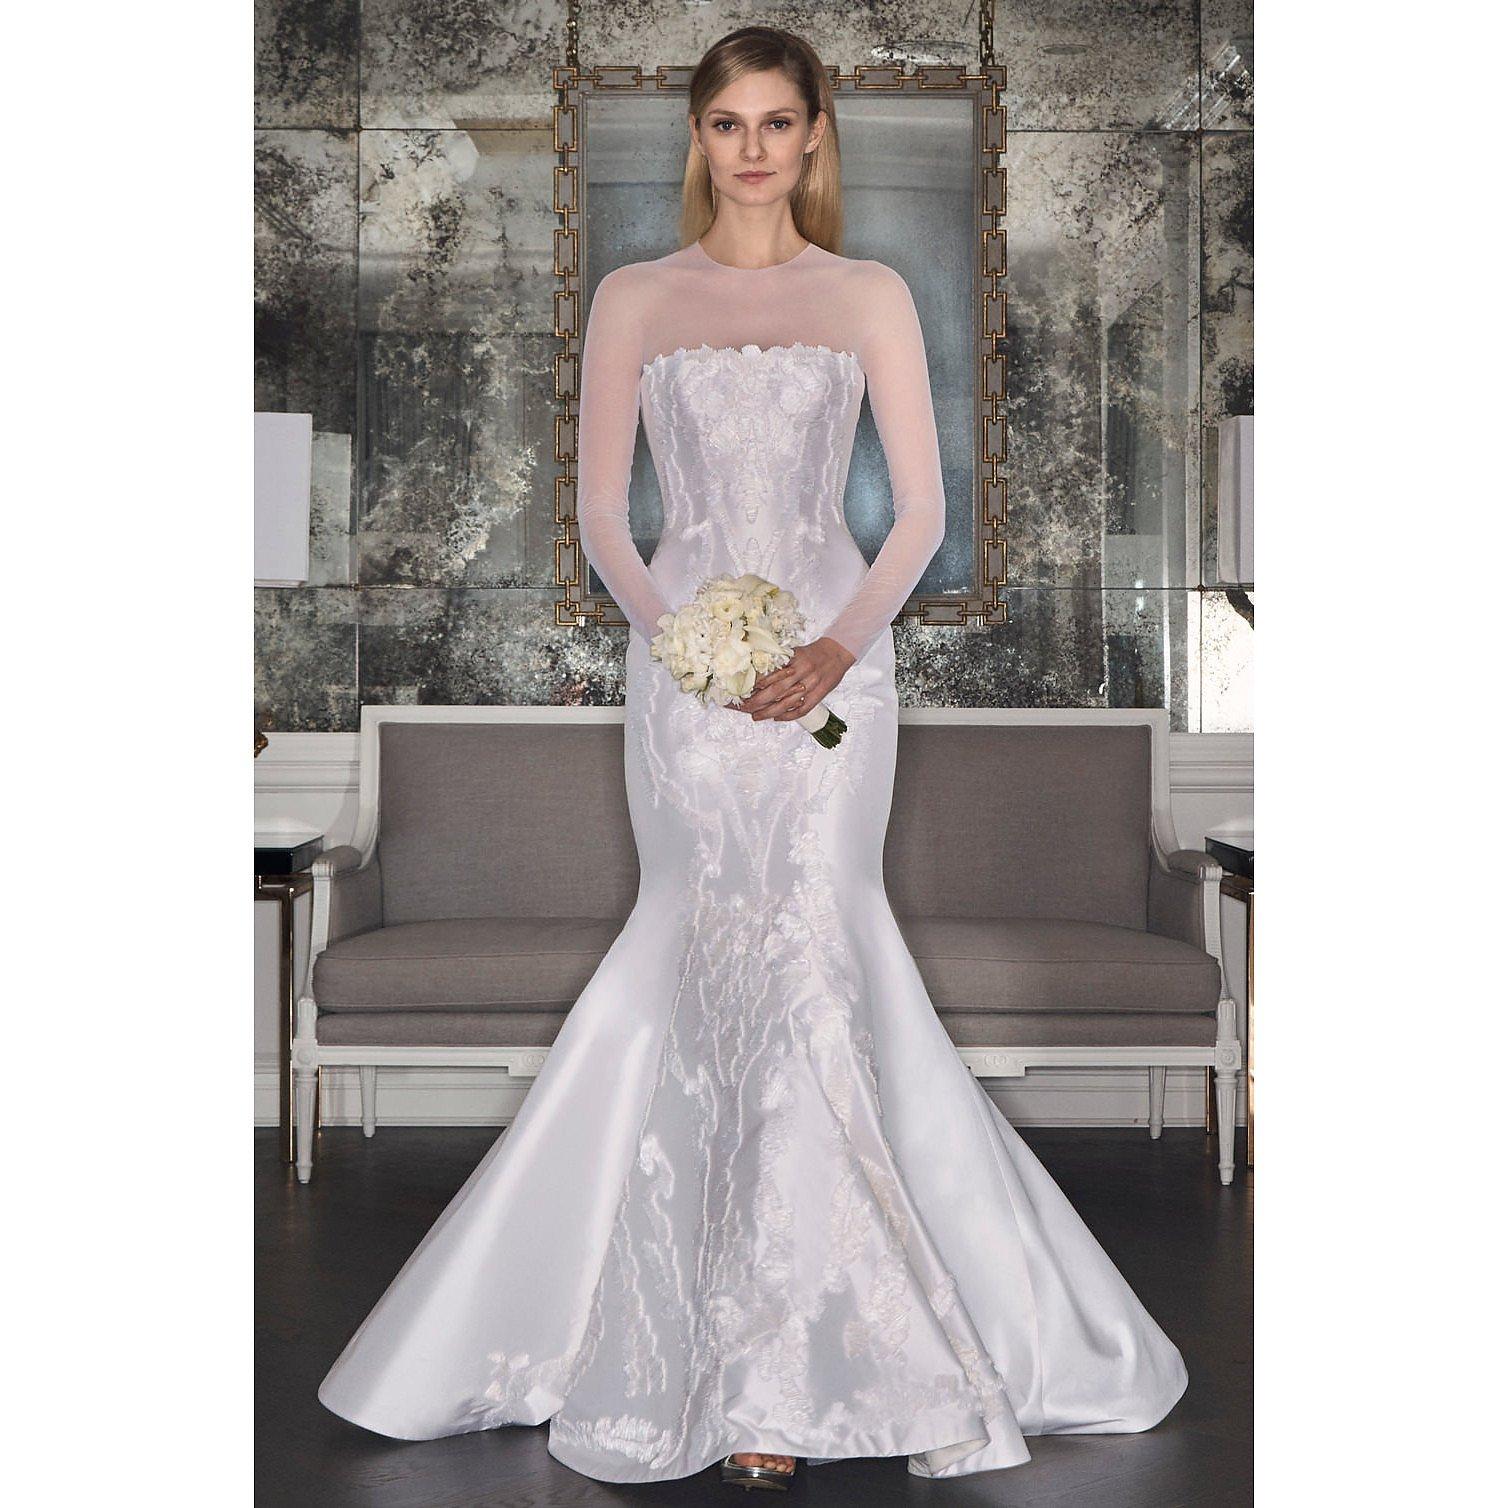 Romona Keveza RK7493 Dress